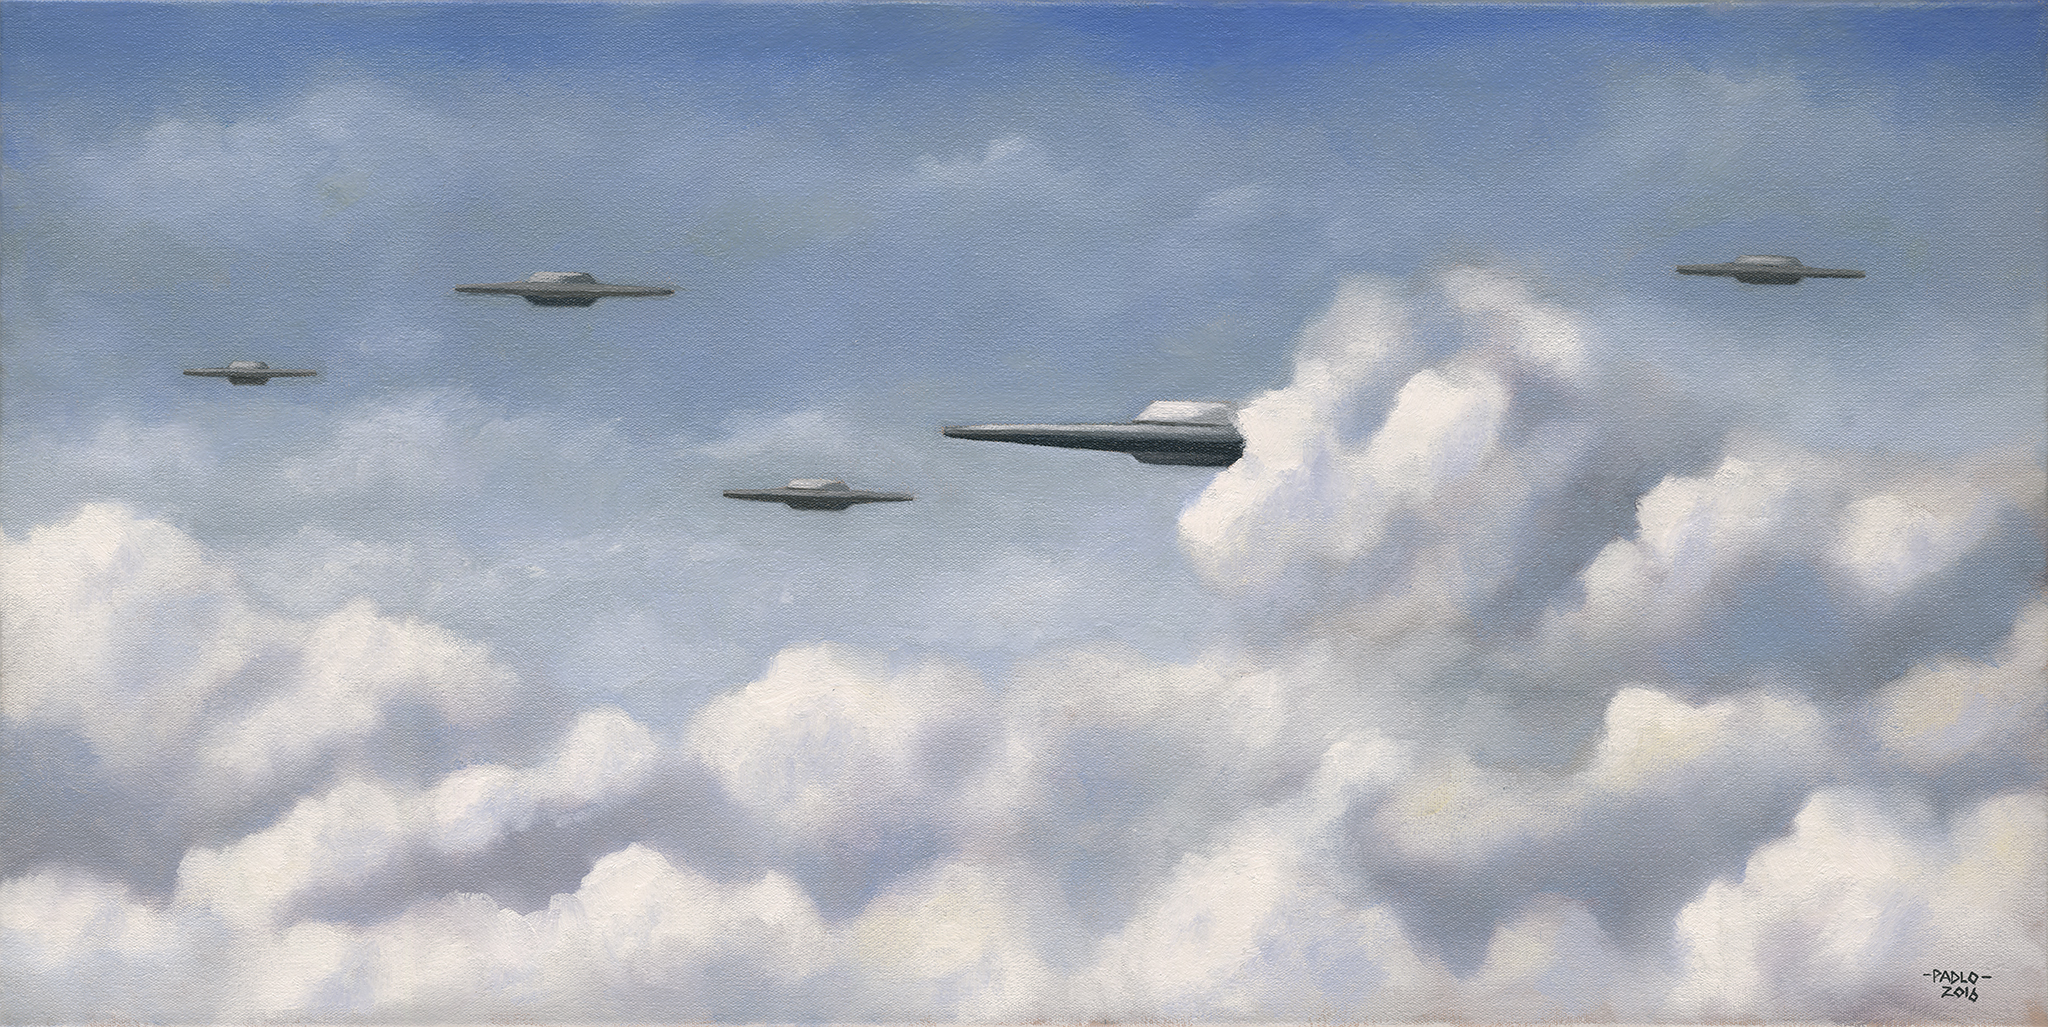 UFO Sighting 42